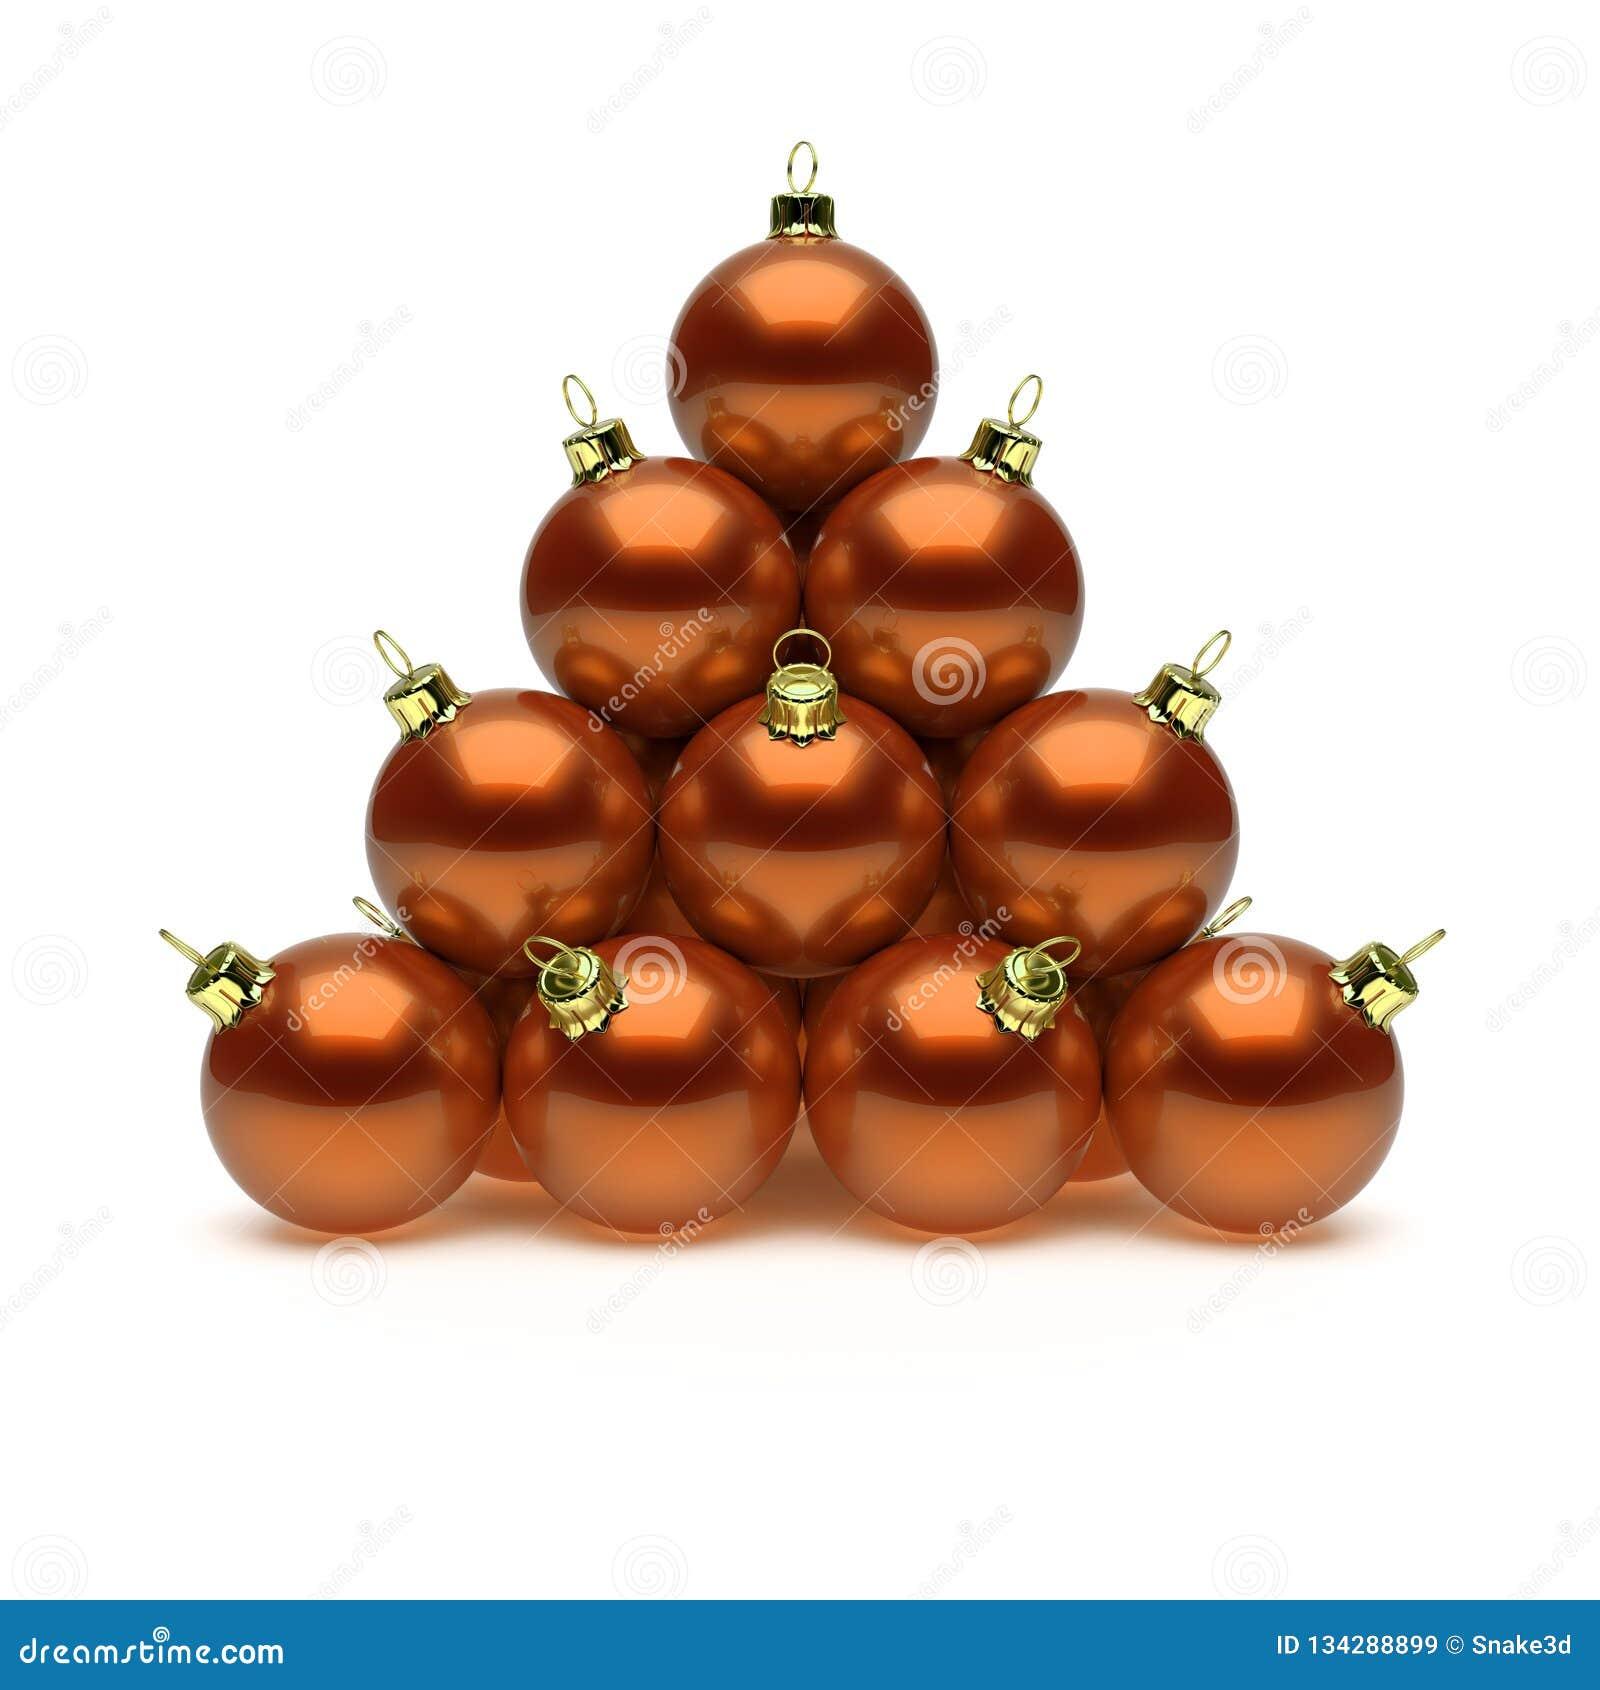 Pyramid of Christmas balls orange shiny golden